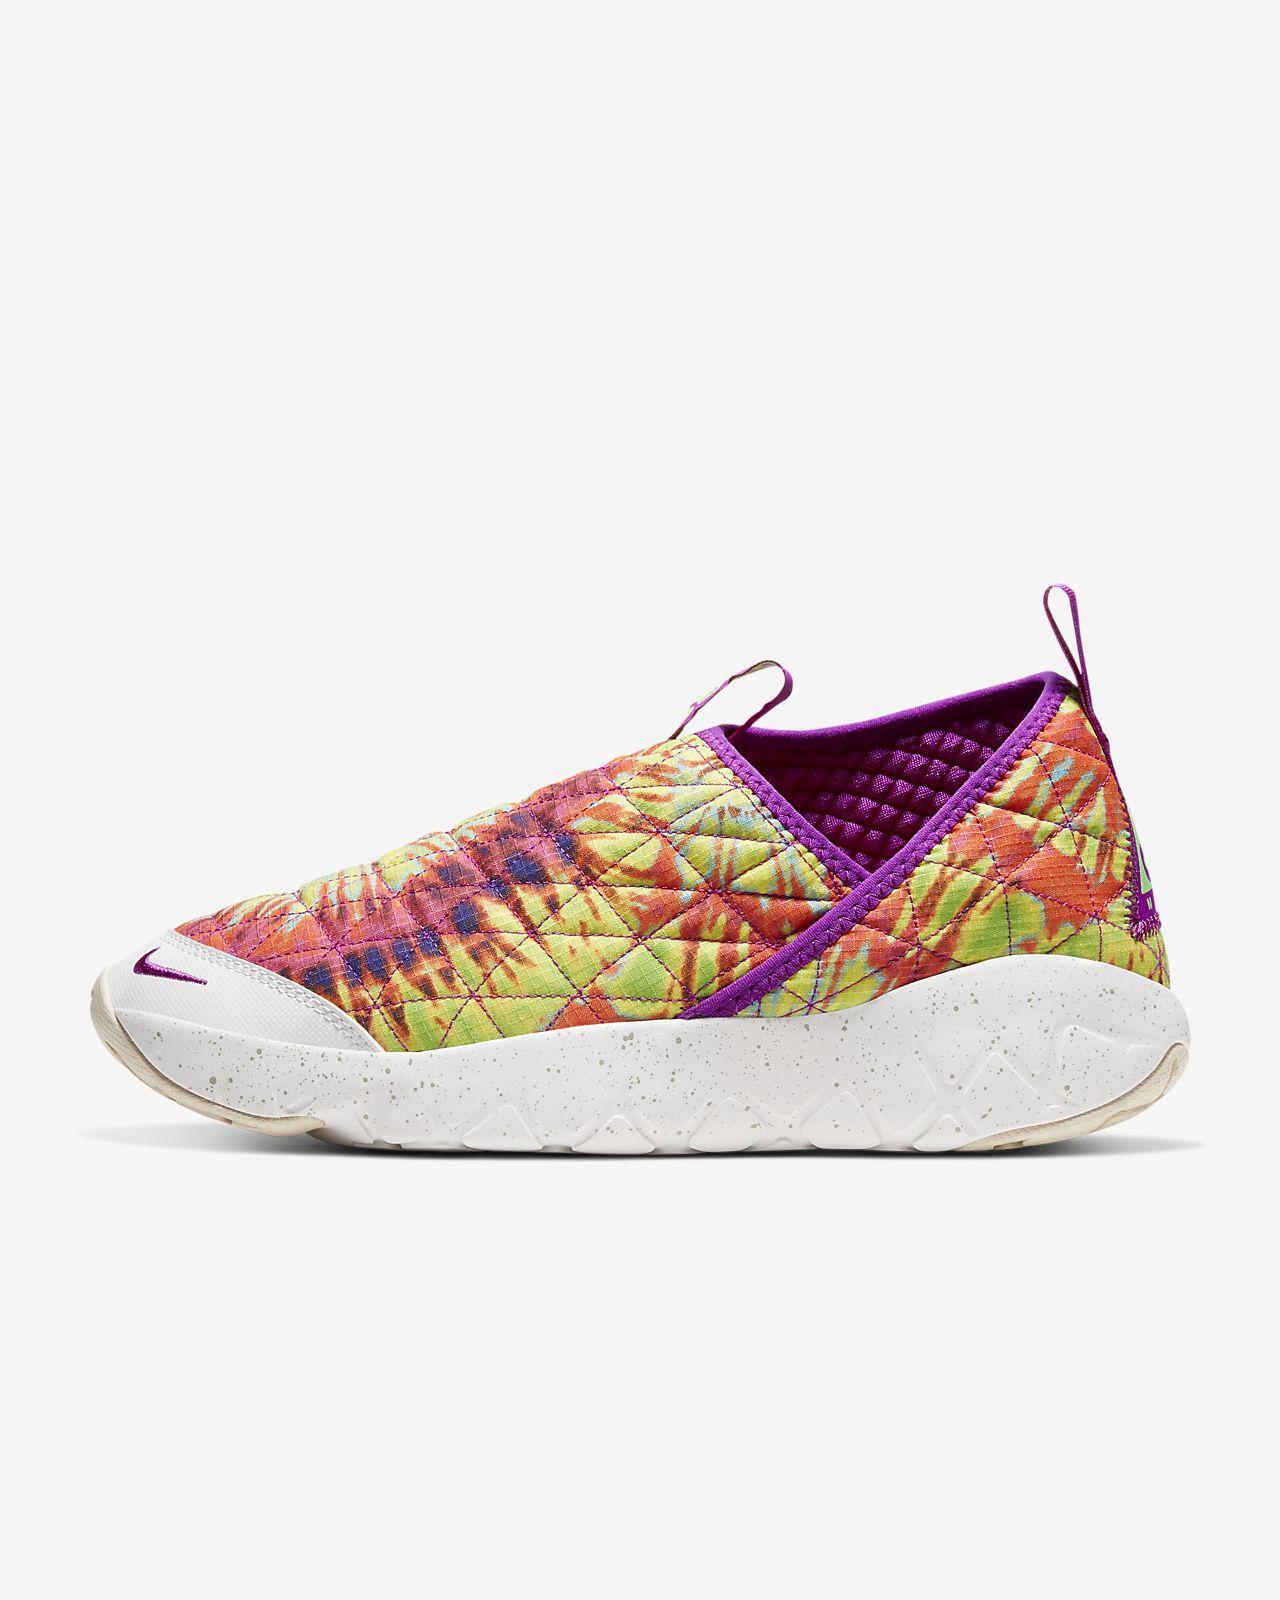 Chaussure Nike ACG MOC 3.0